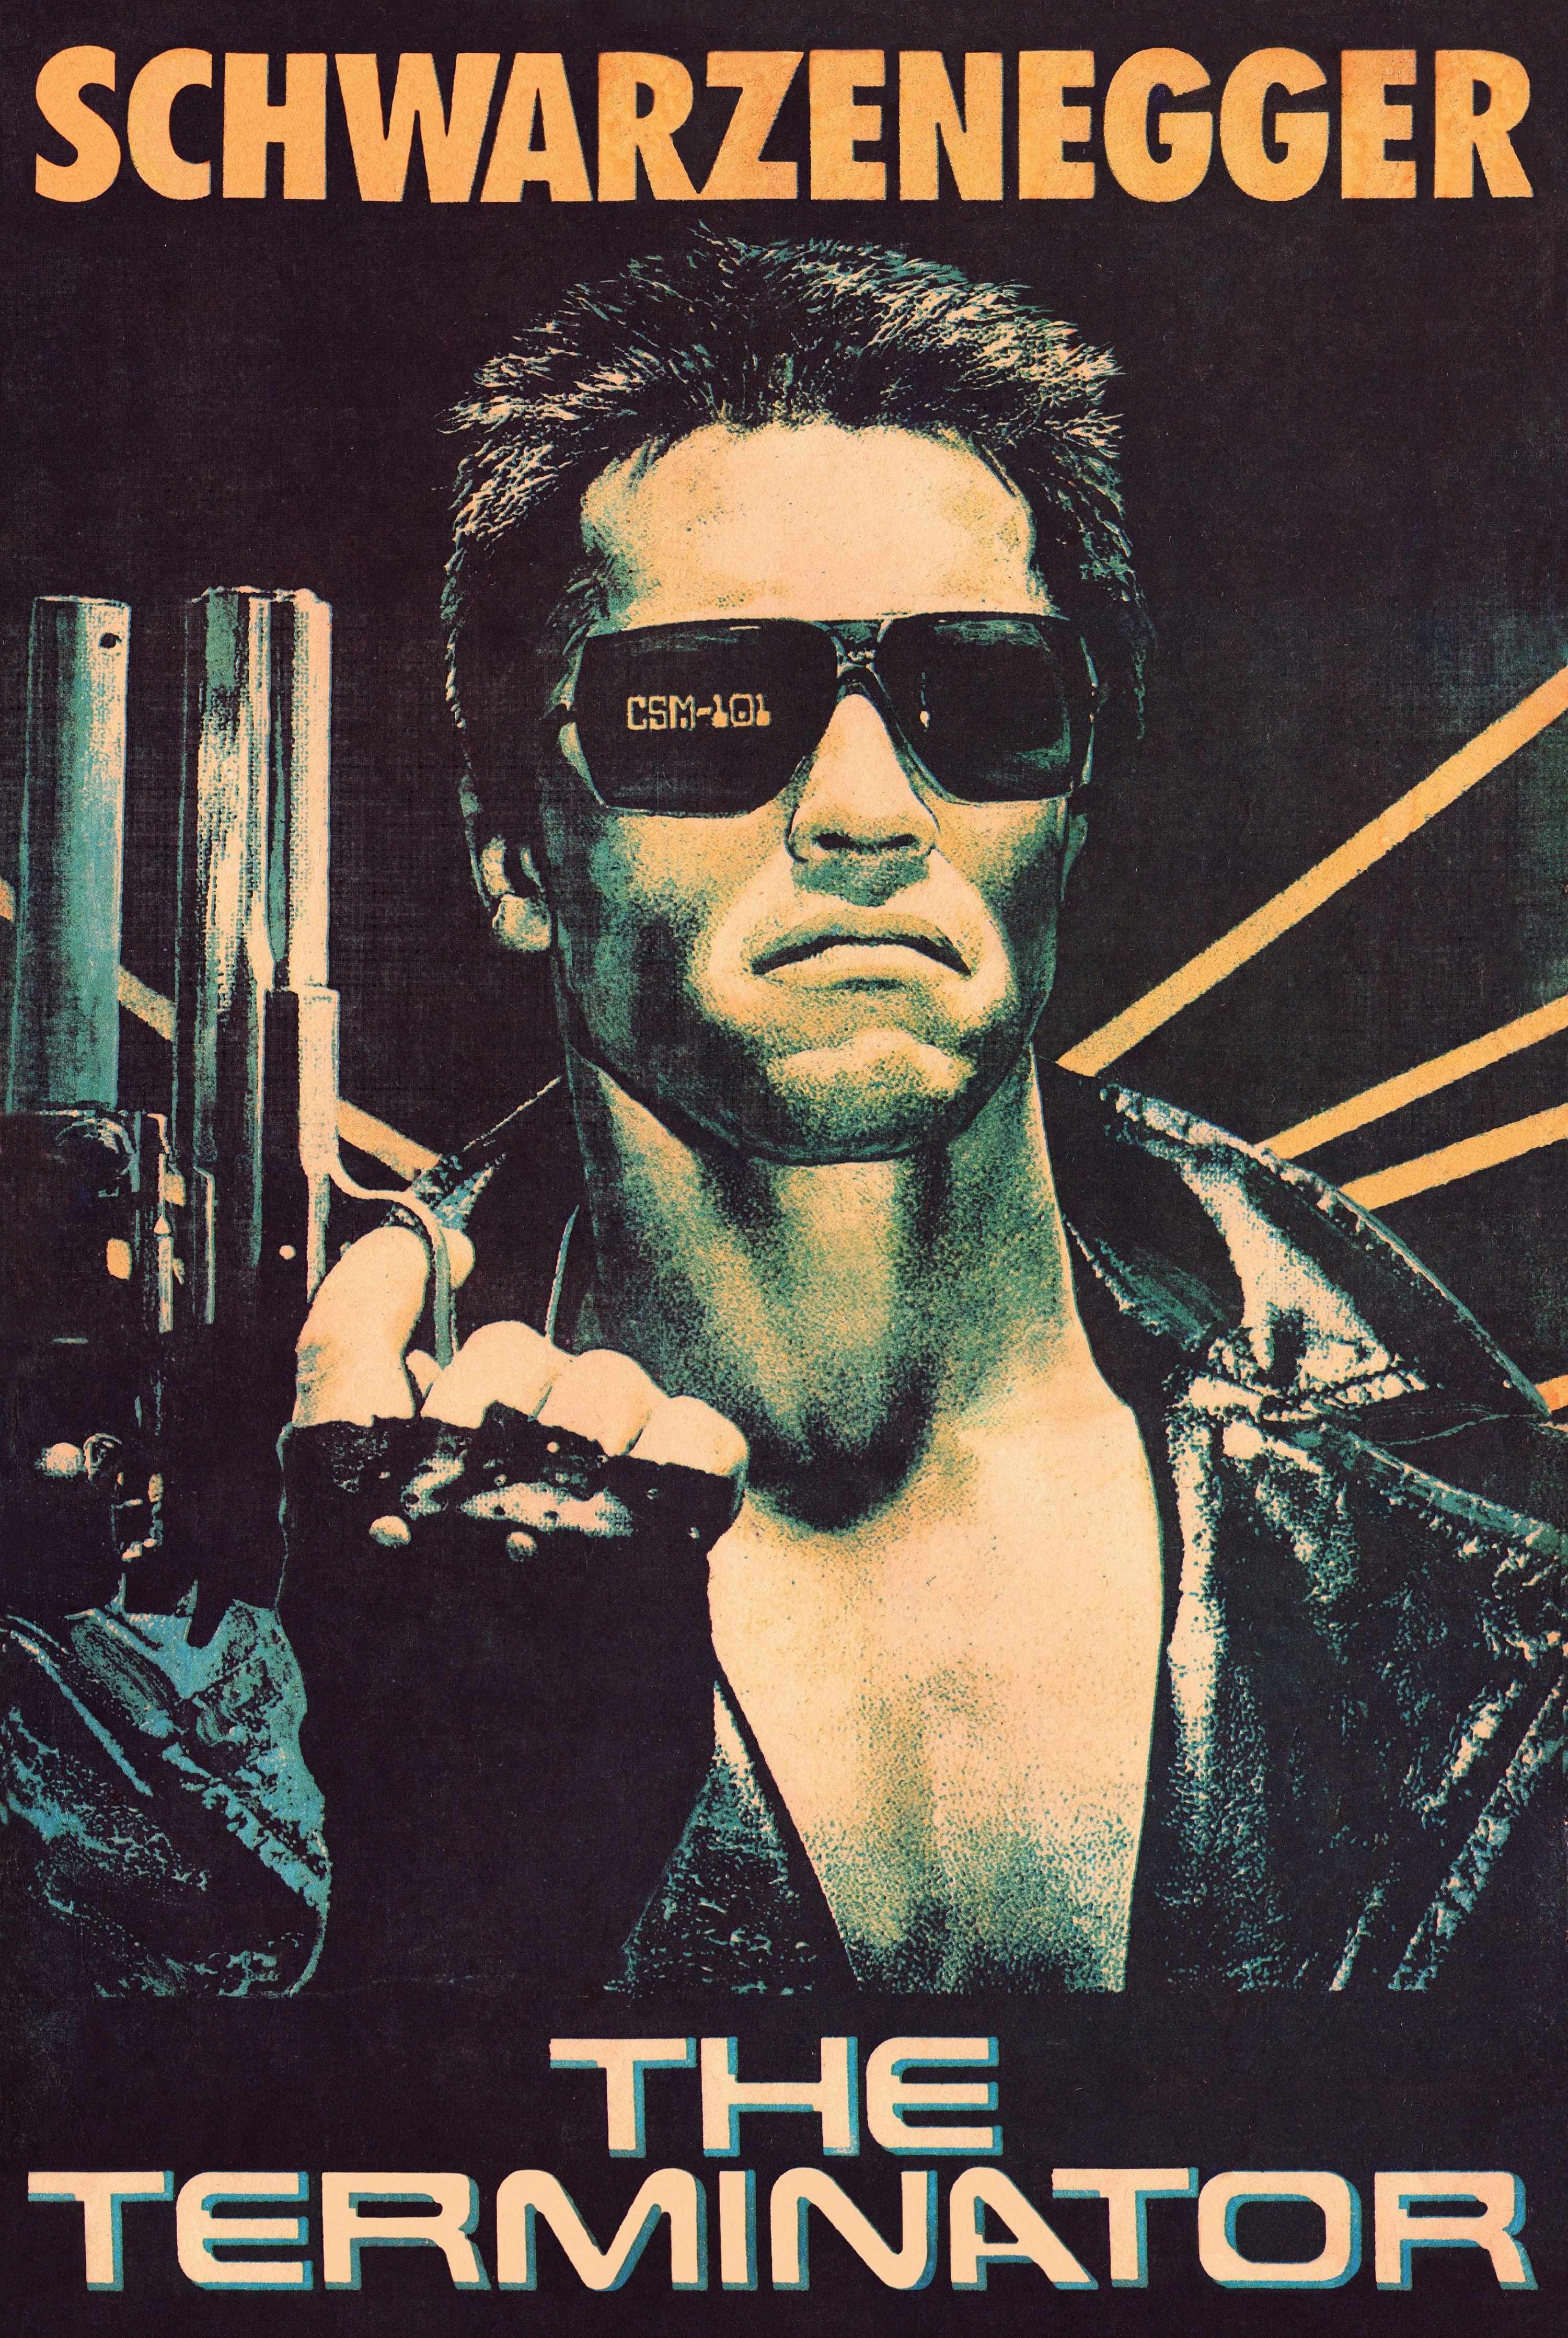 Poster the Terminator / Arnold Schwarzenegger ( 1984 ) USSR